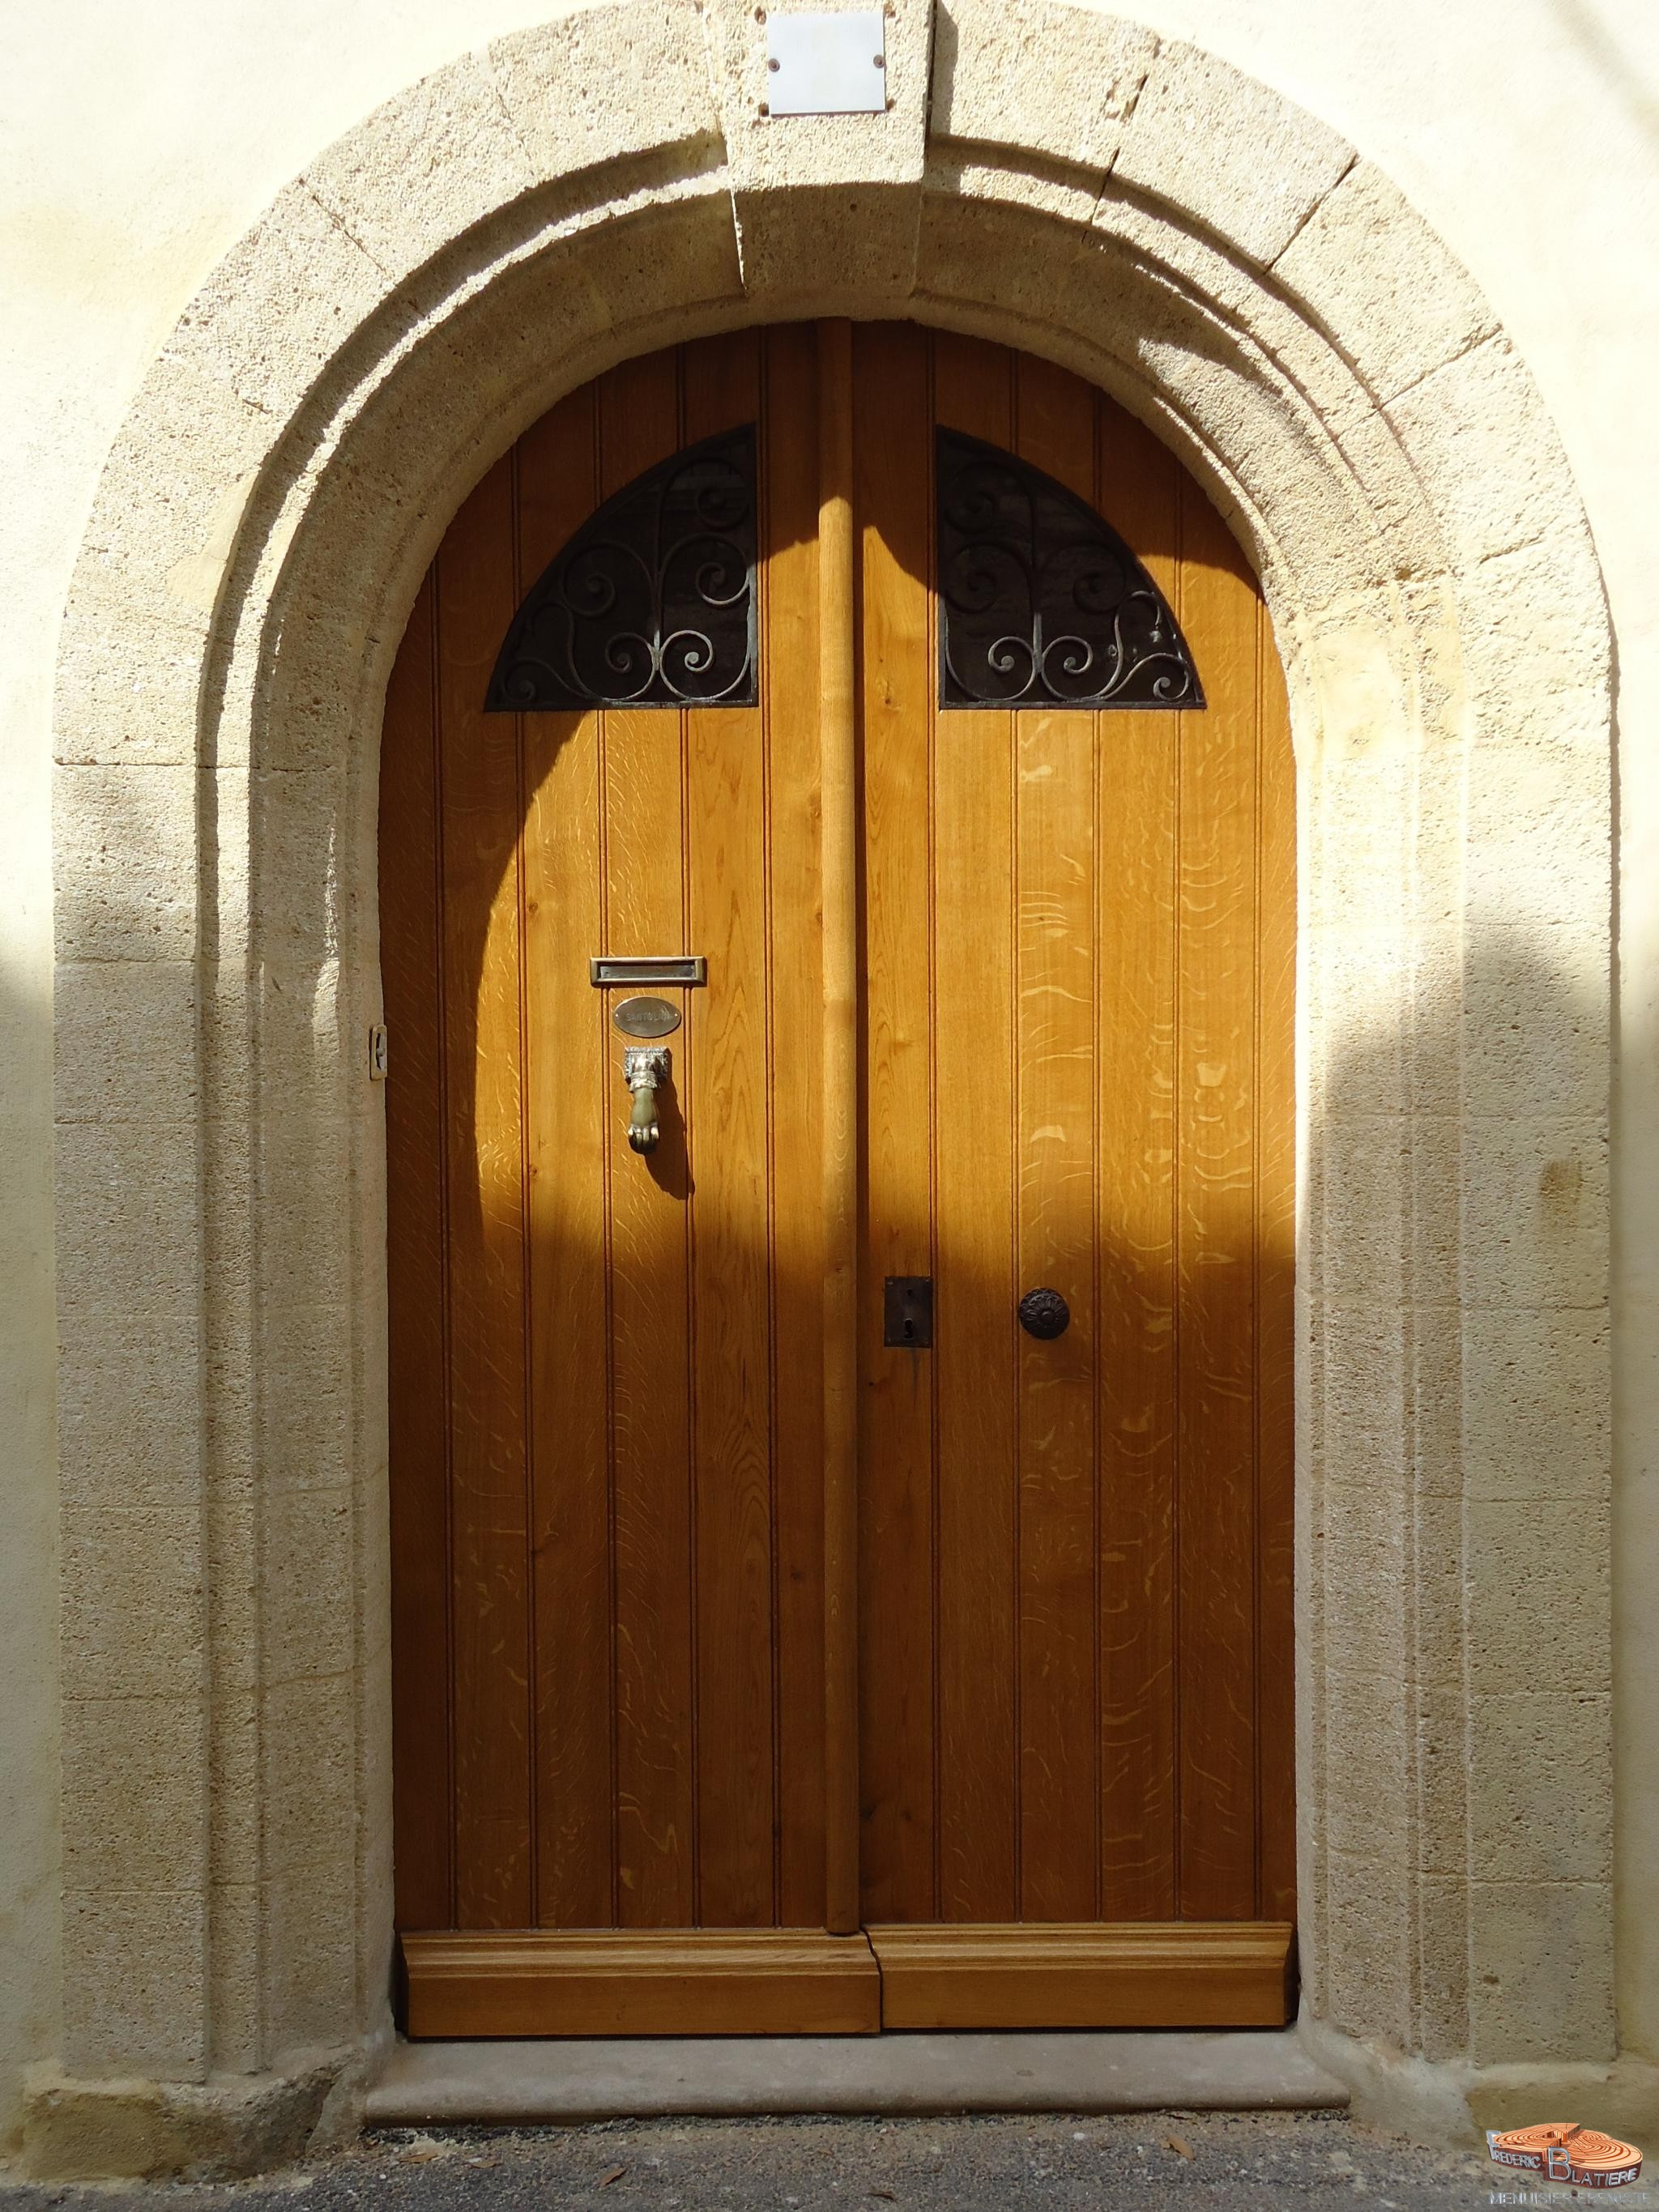 grande porte d entre porte duentre schco blanche avec imposte with grande porte d entre porte. Black Bedroom Furniture Sets. Home Design Ideas